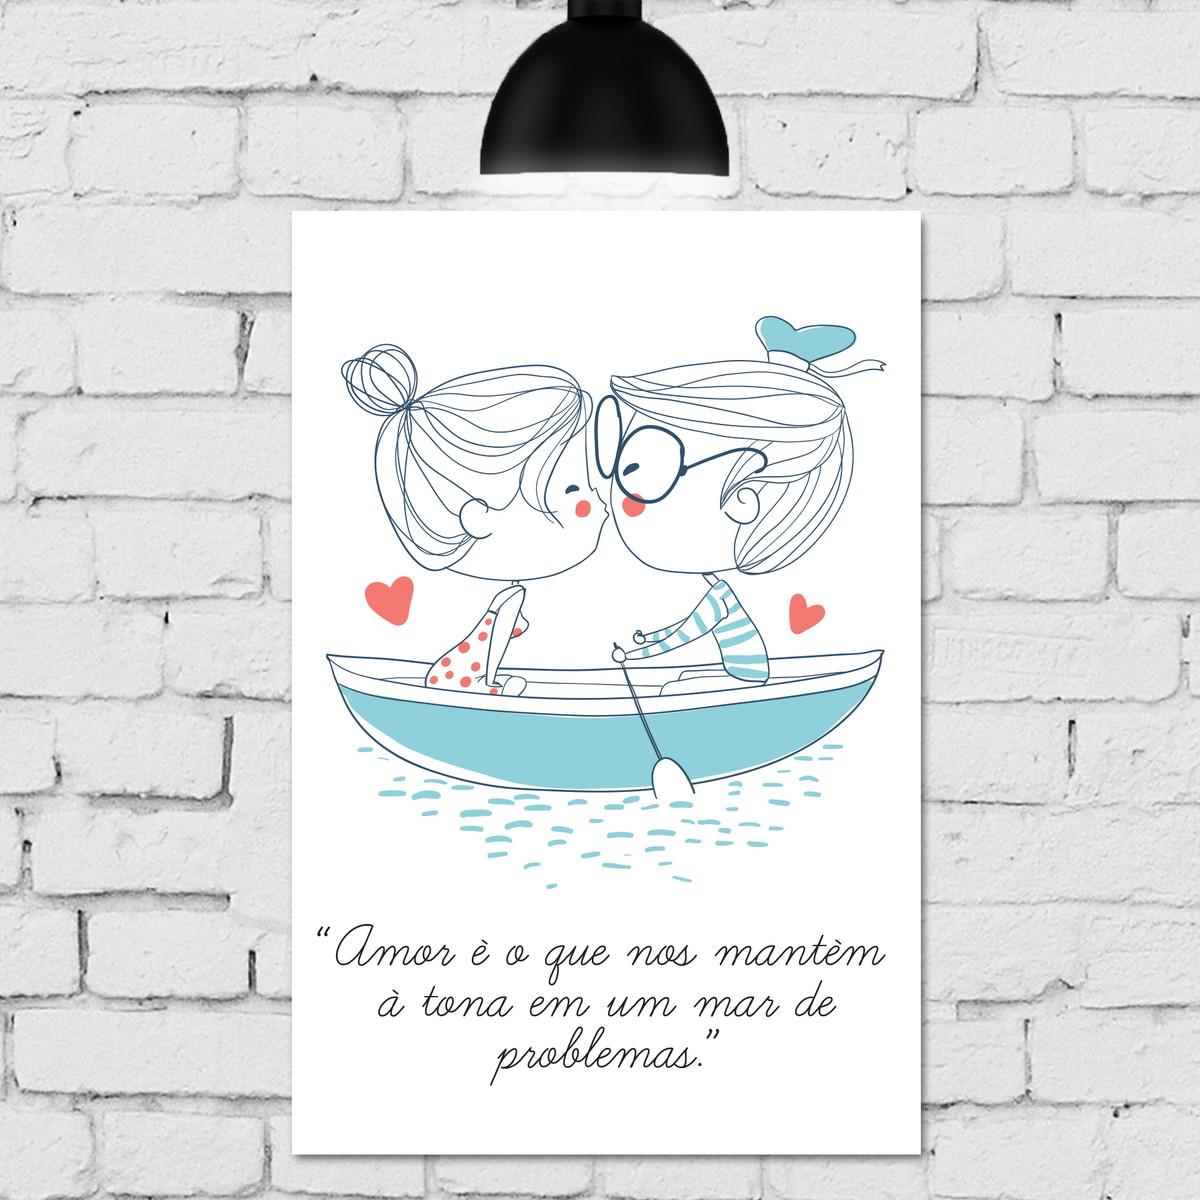 Placa Decorativa Mdf Frase Amor Casal Namorados Barco No Elo7